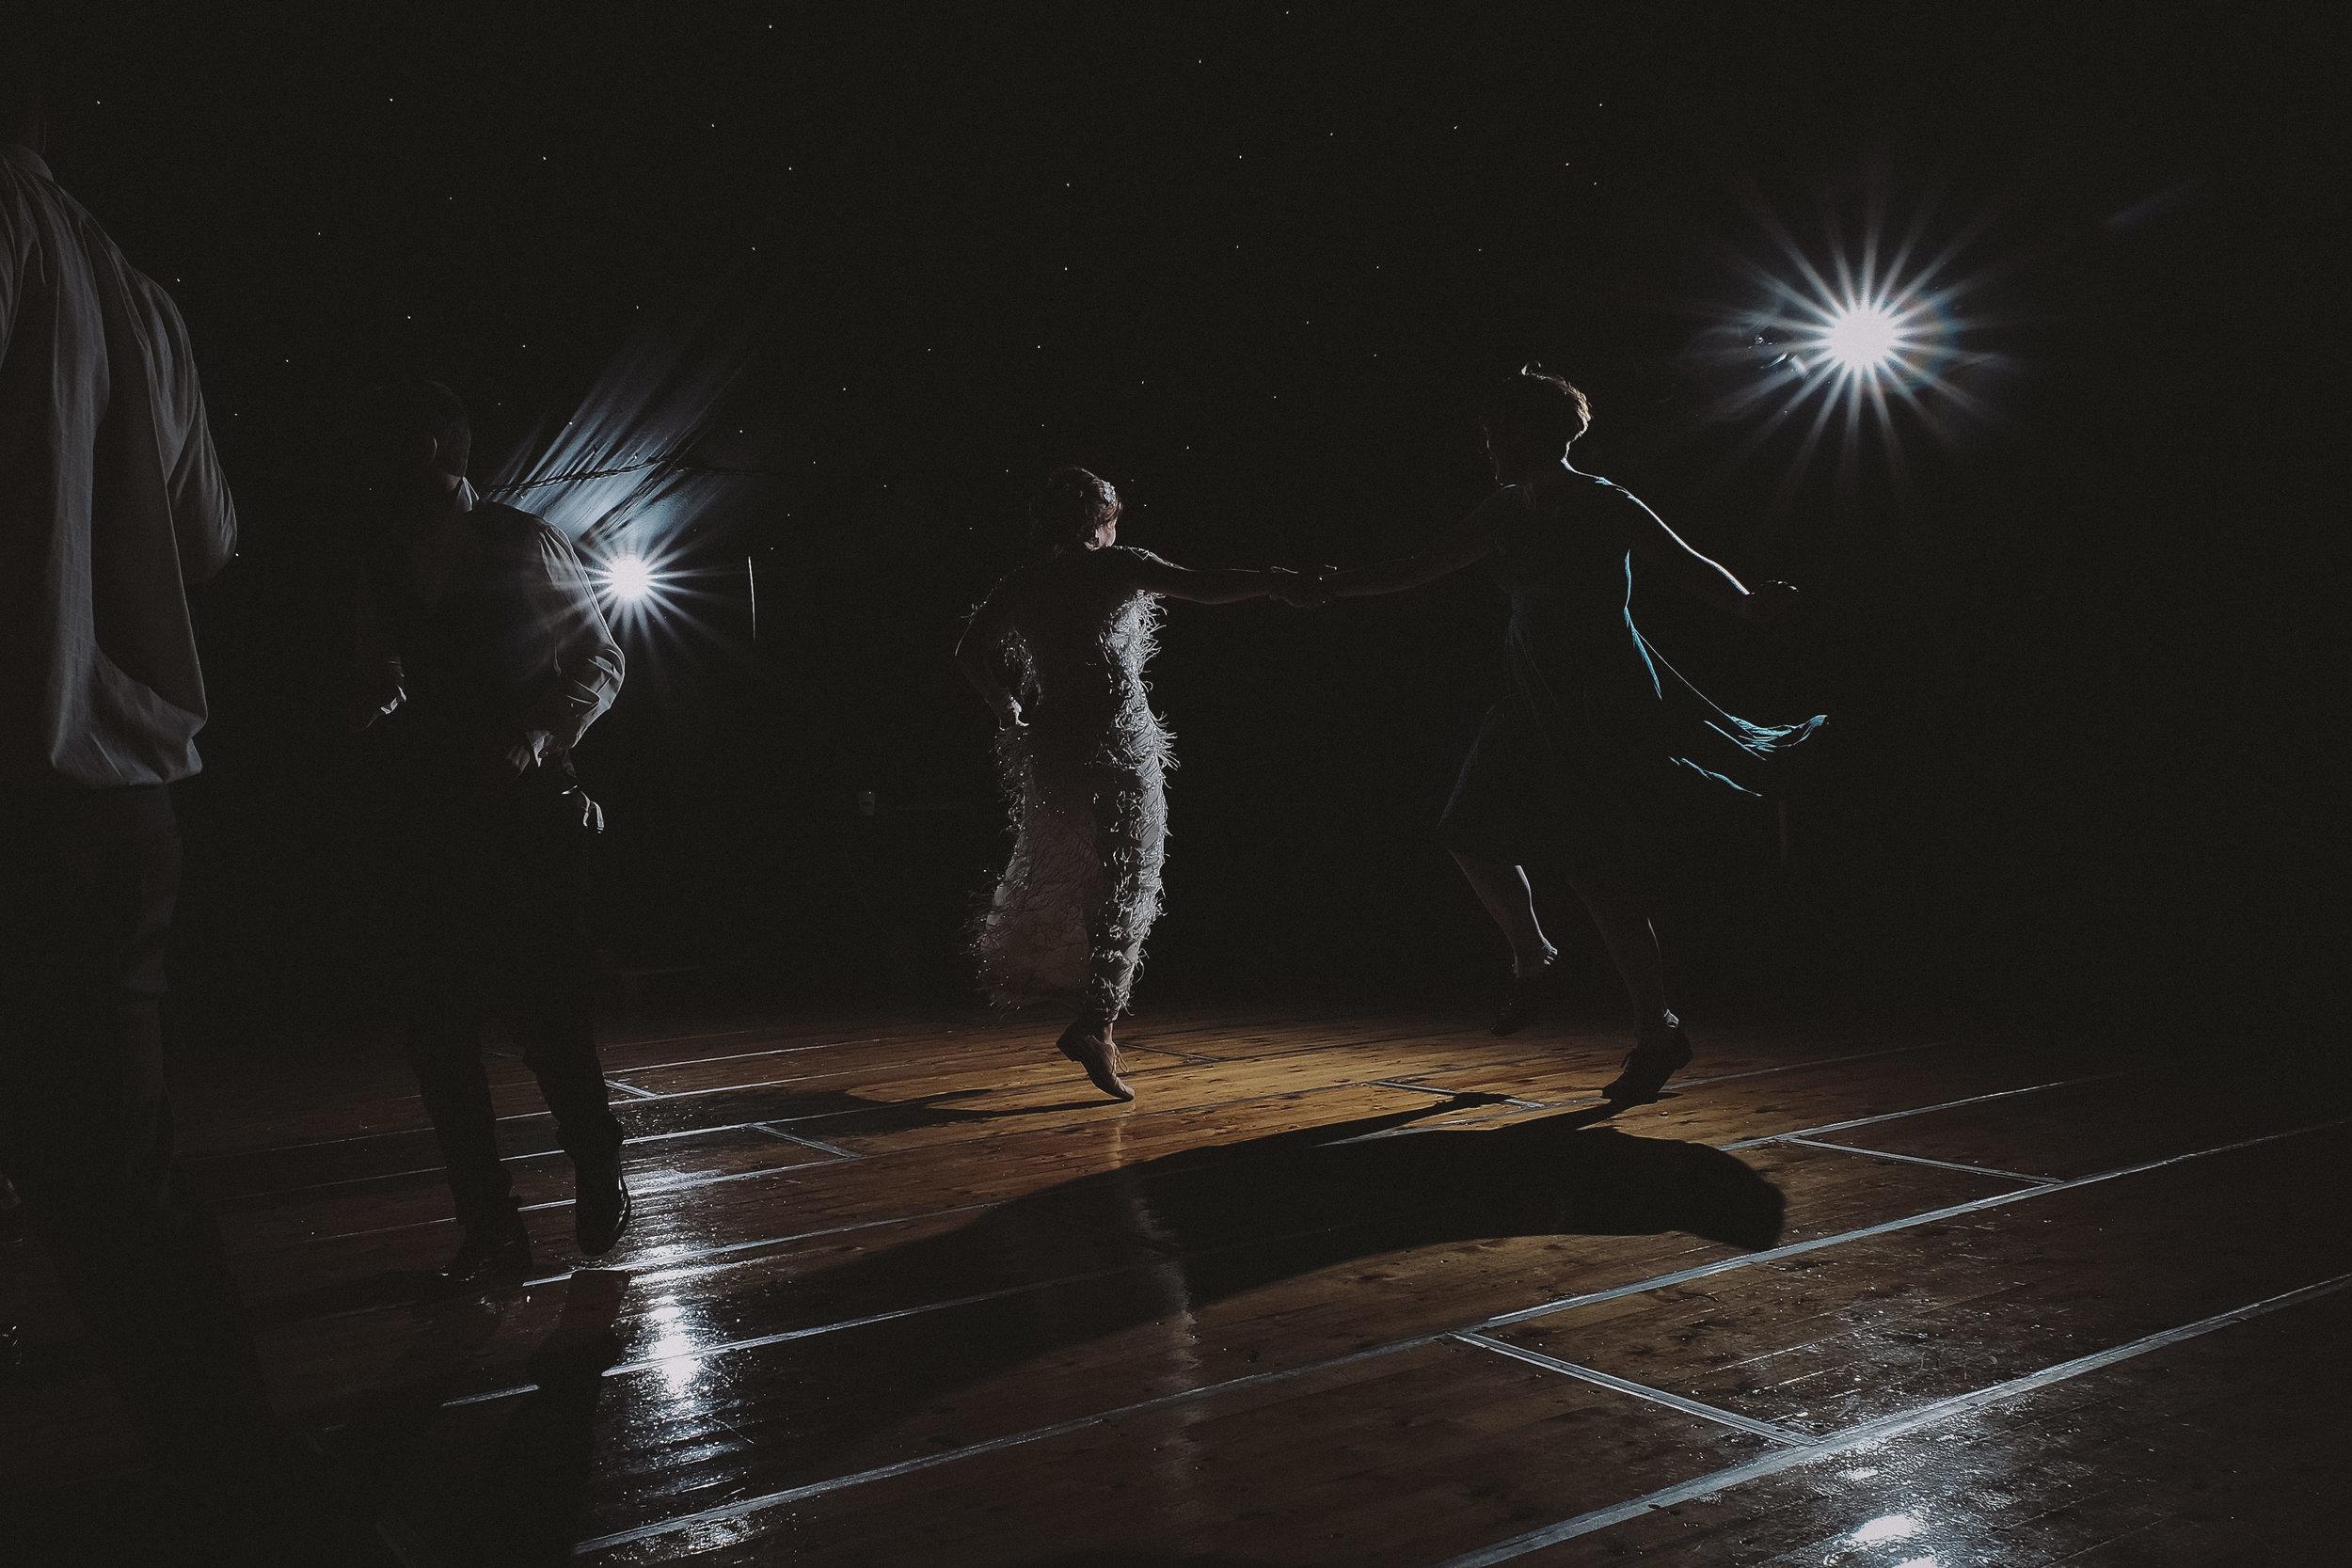 Bride and bridesmaid dance vigorously in dramatic light